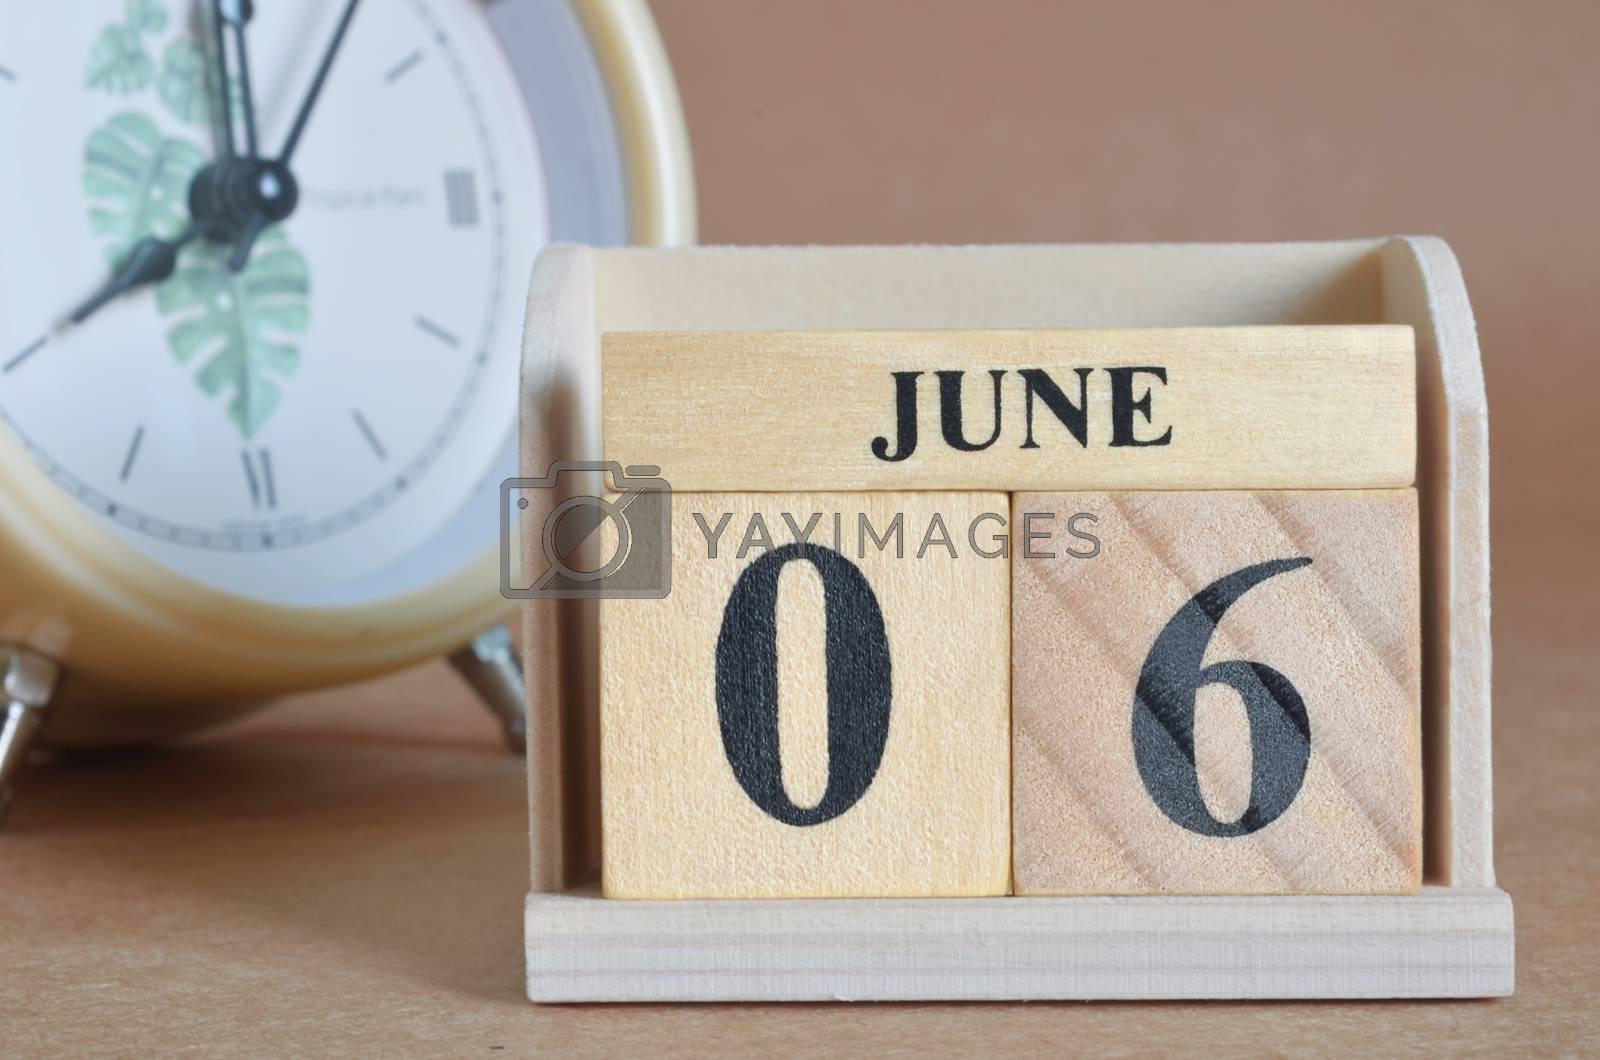 June 6 by Mrfrost